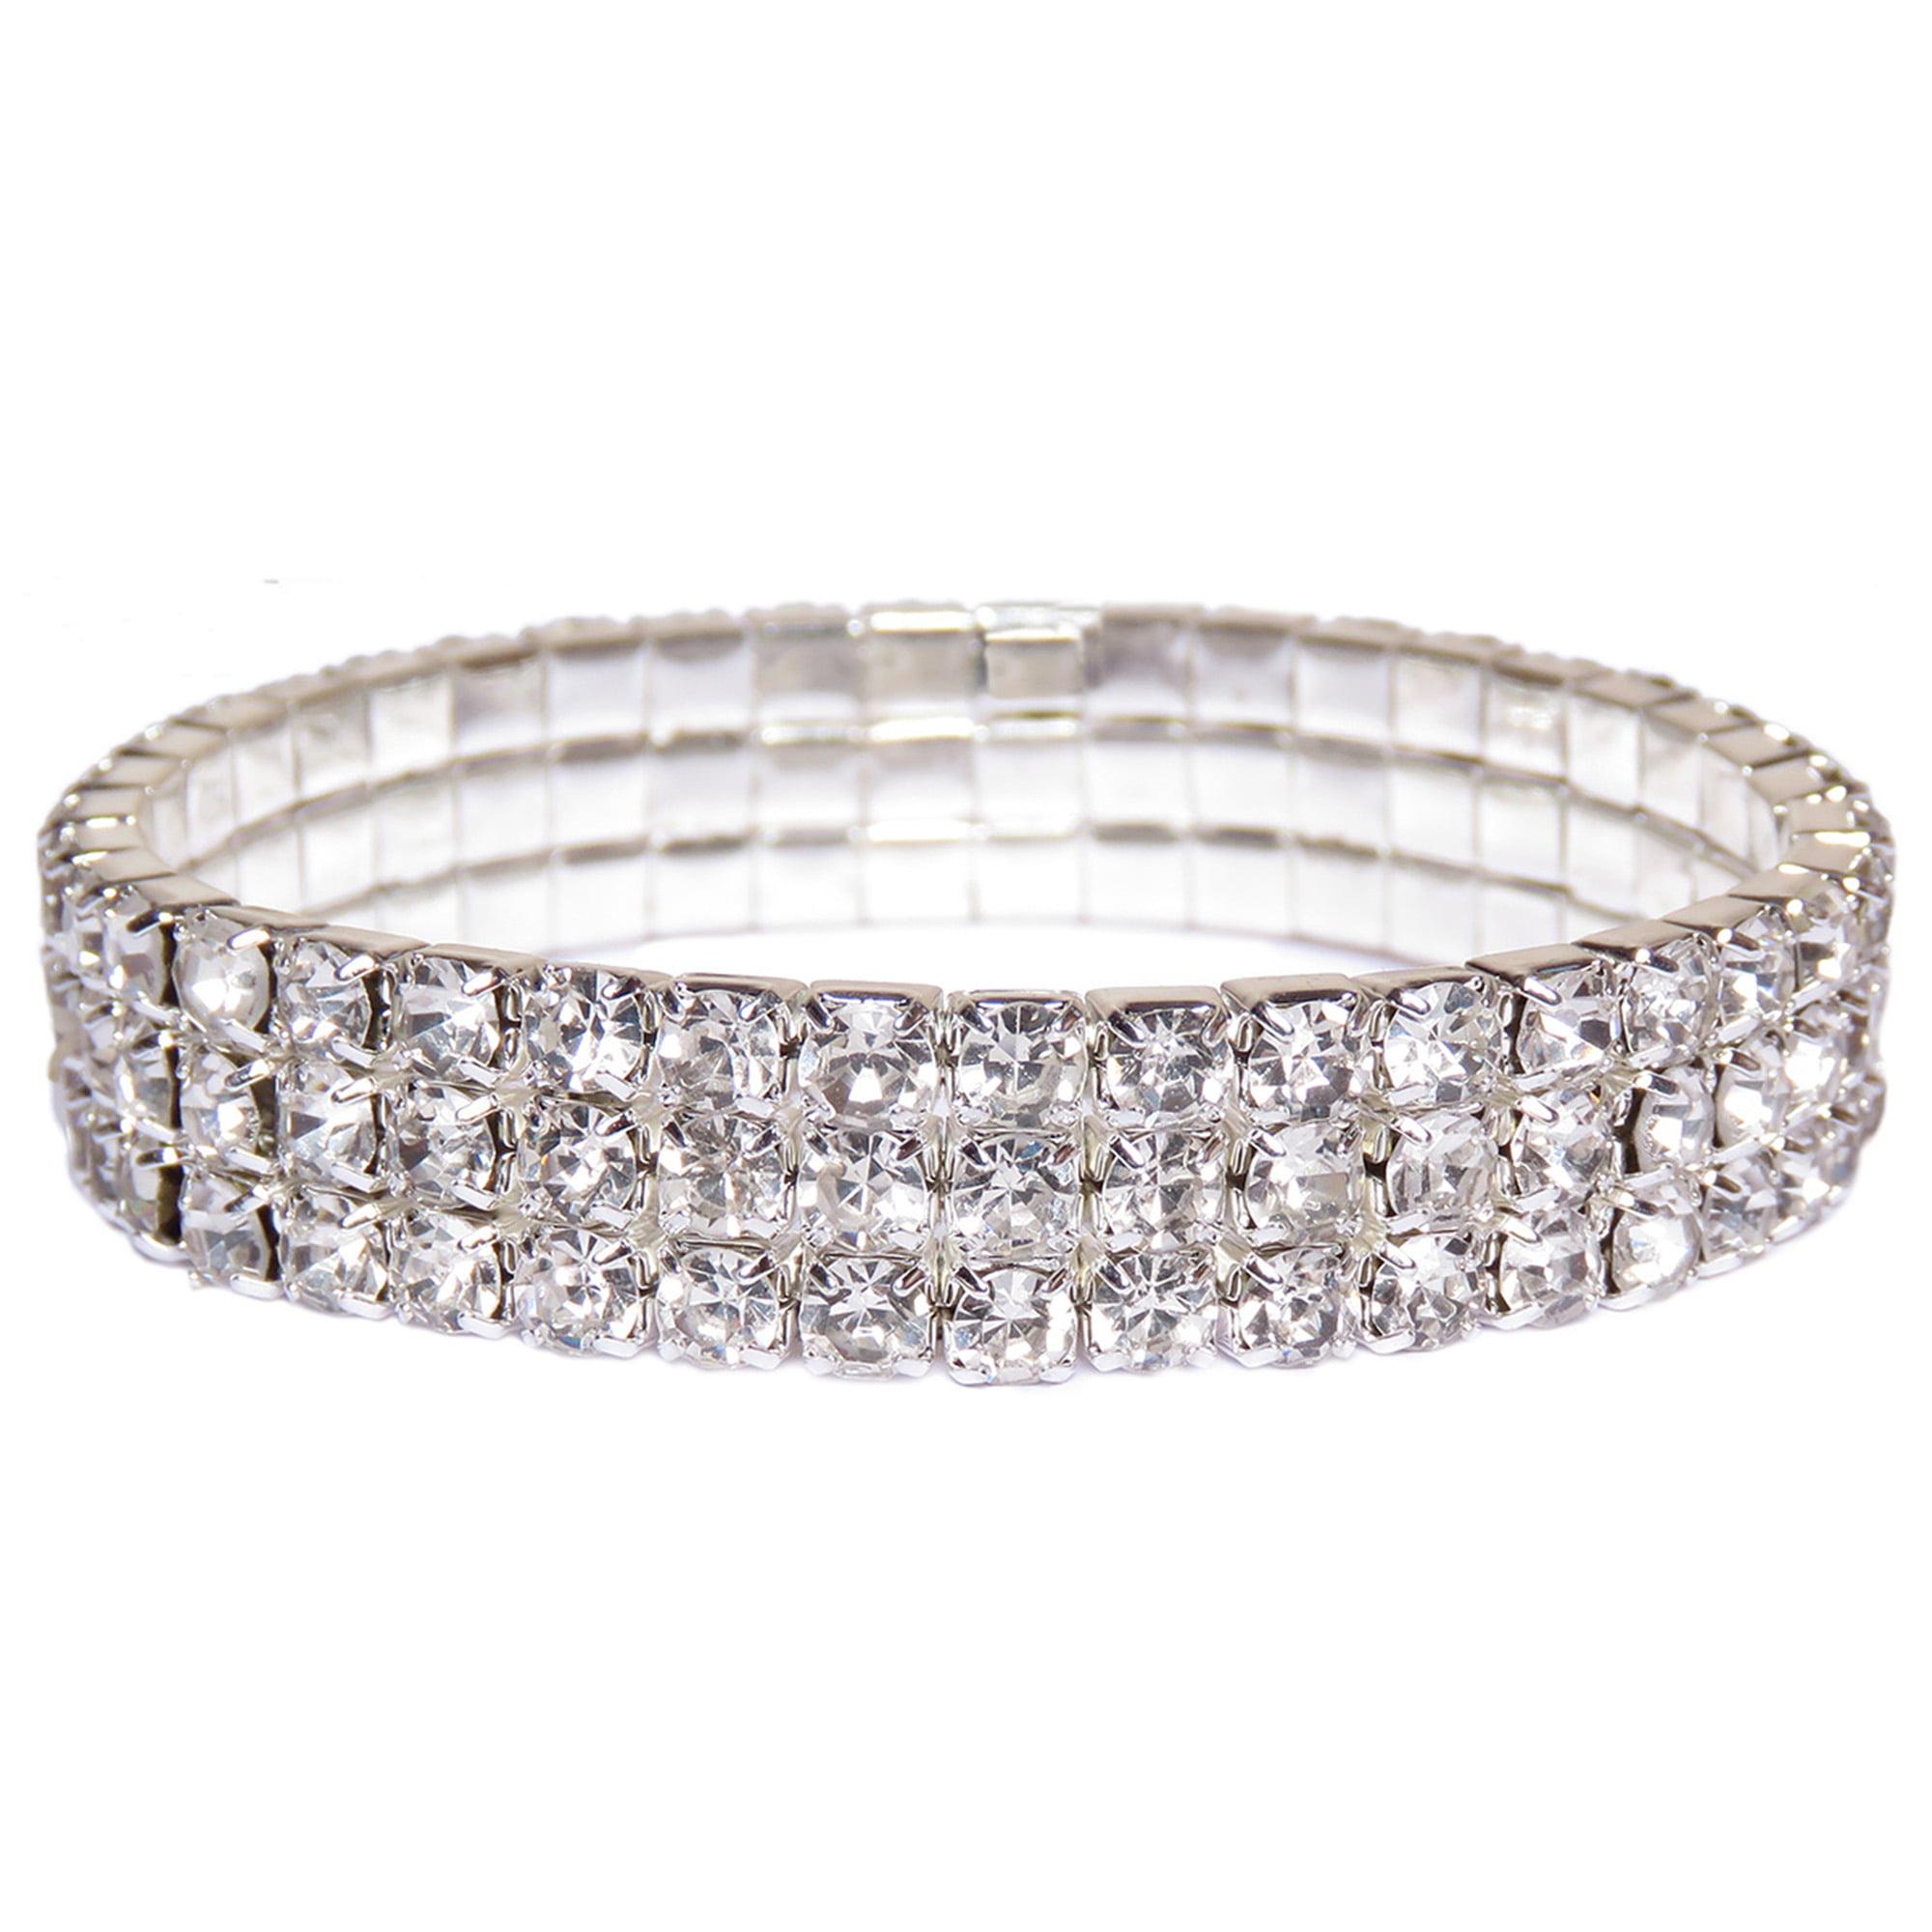 Oussum Silver Crystal Tennis Bracelets For Women Three